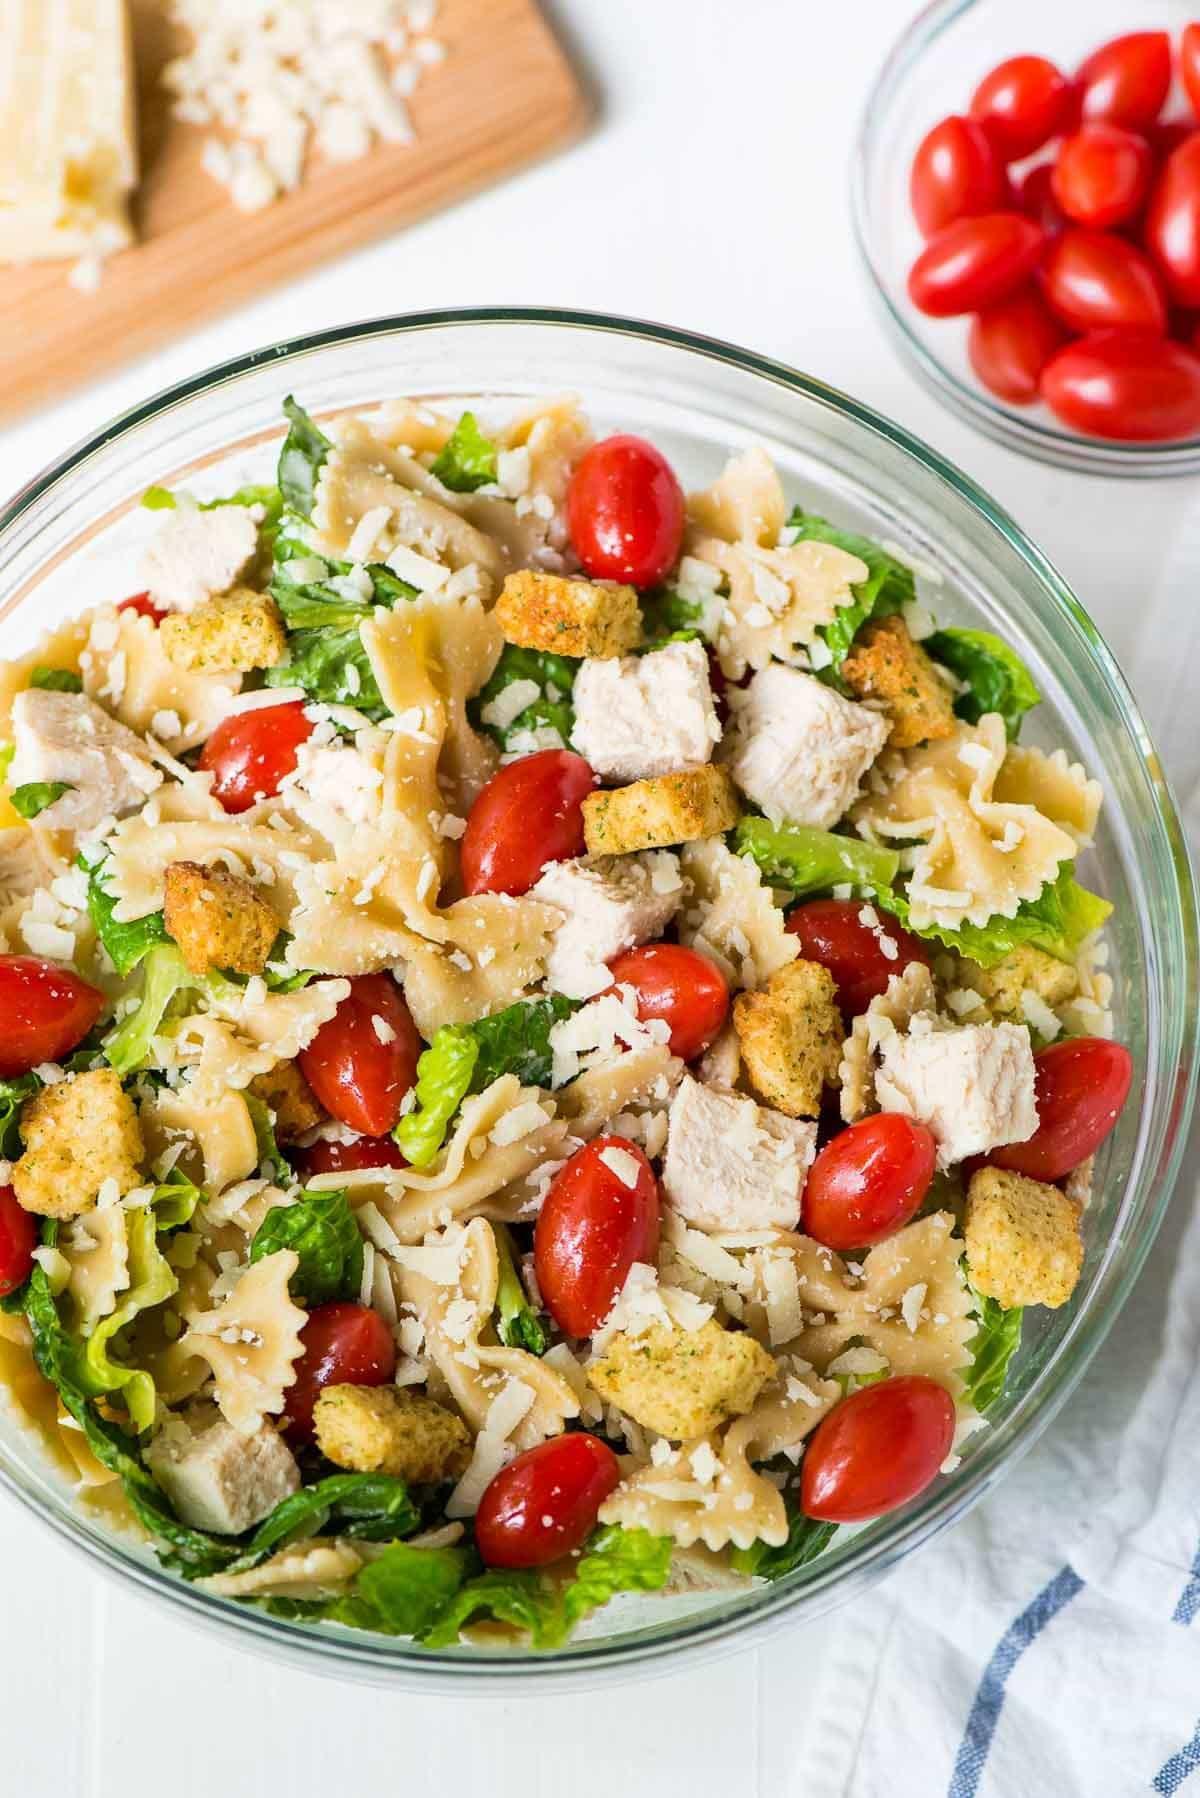 Healthy Pasta Salad Recipes  Asian Noodle Salad with Creamy Peanut Dressing